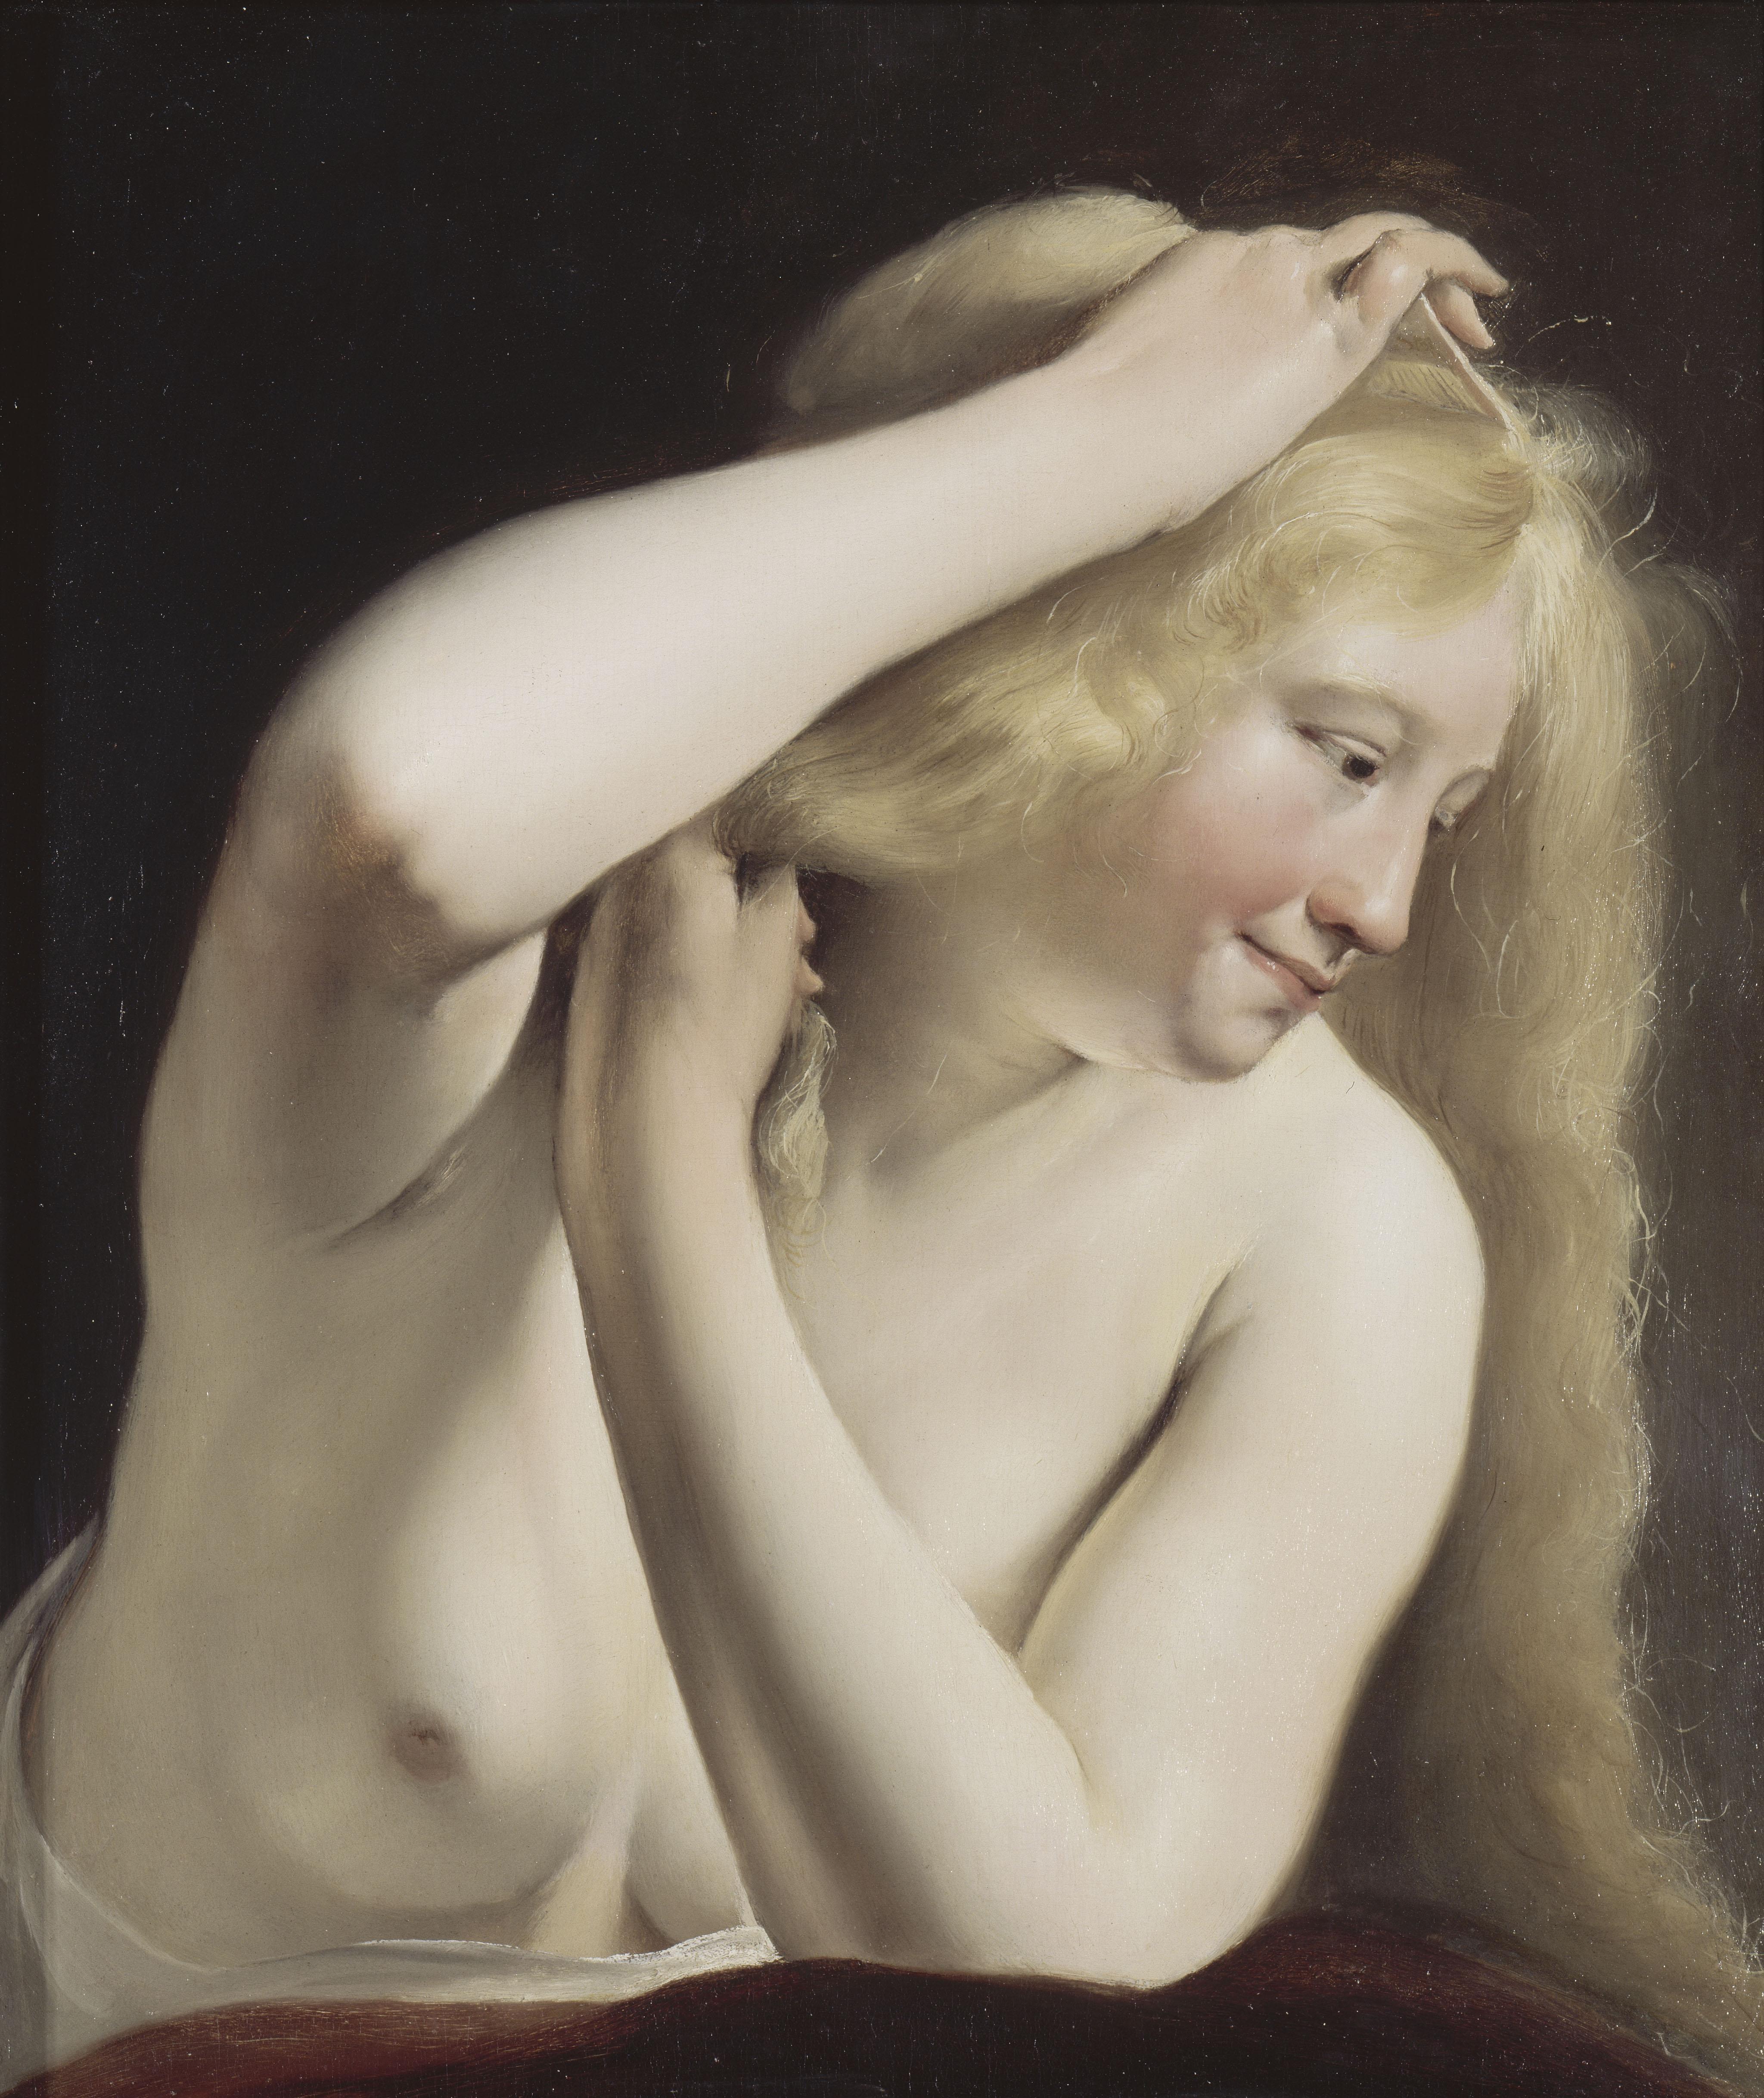 Michigan femmes nue miniature